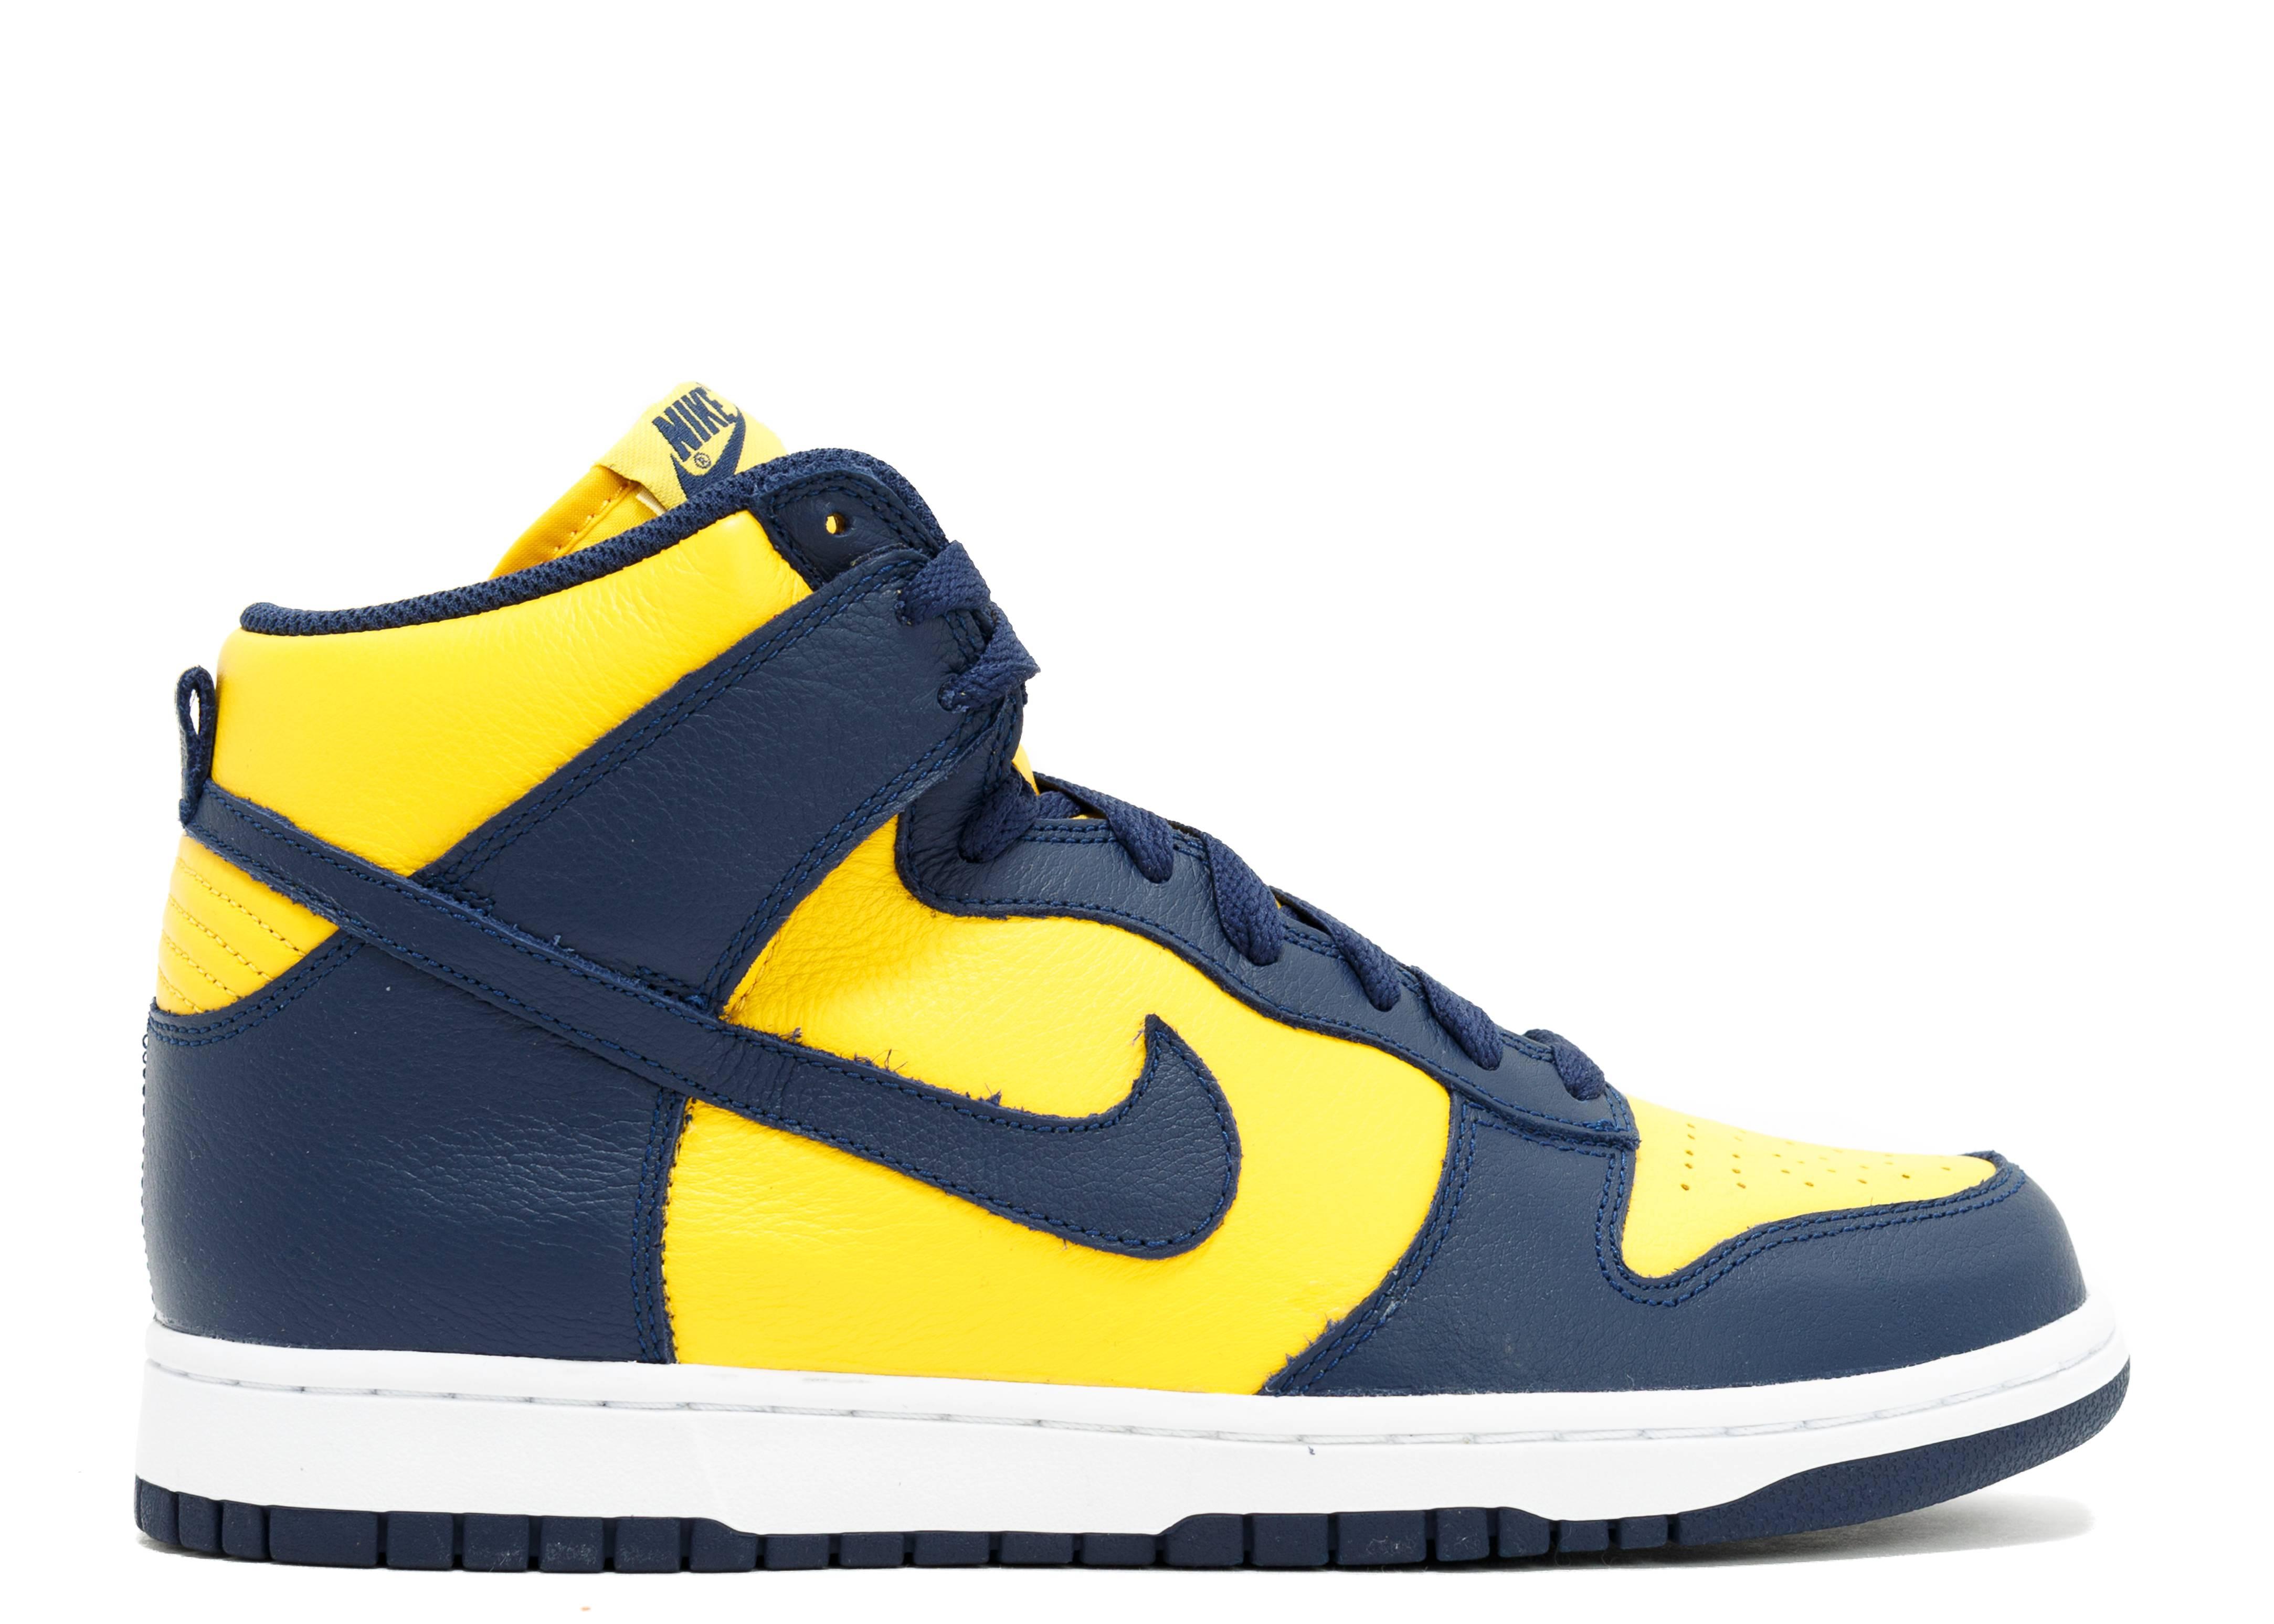 Nike Womens Shoes - Nike Dunk Retro QS Varsity Maize/Midnight Navy X32z7702